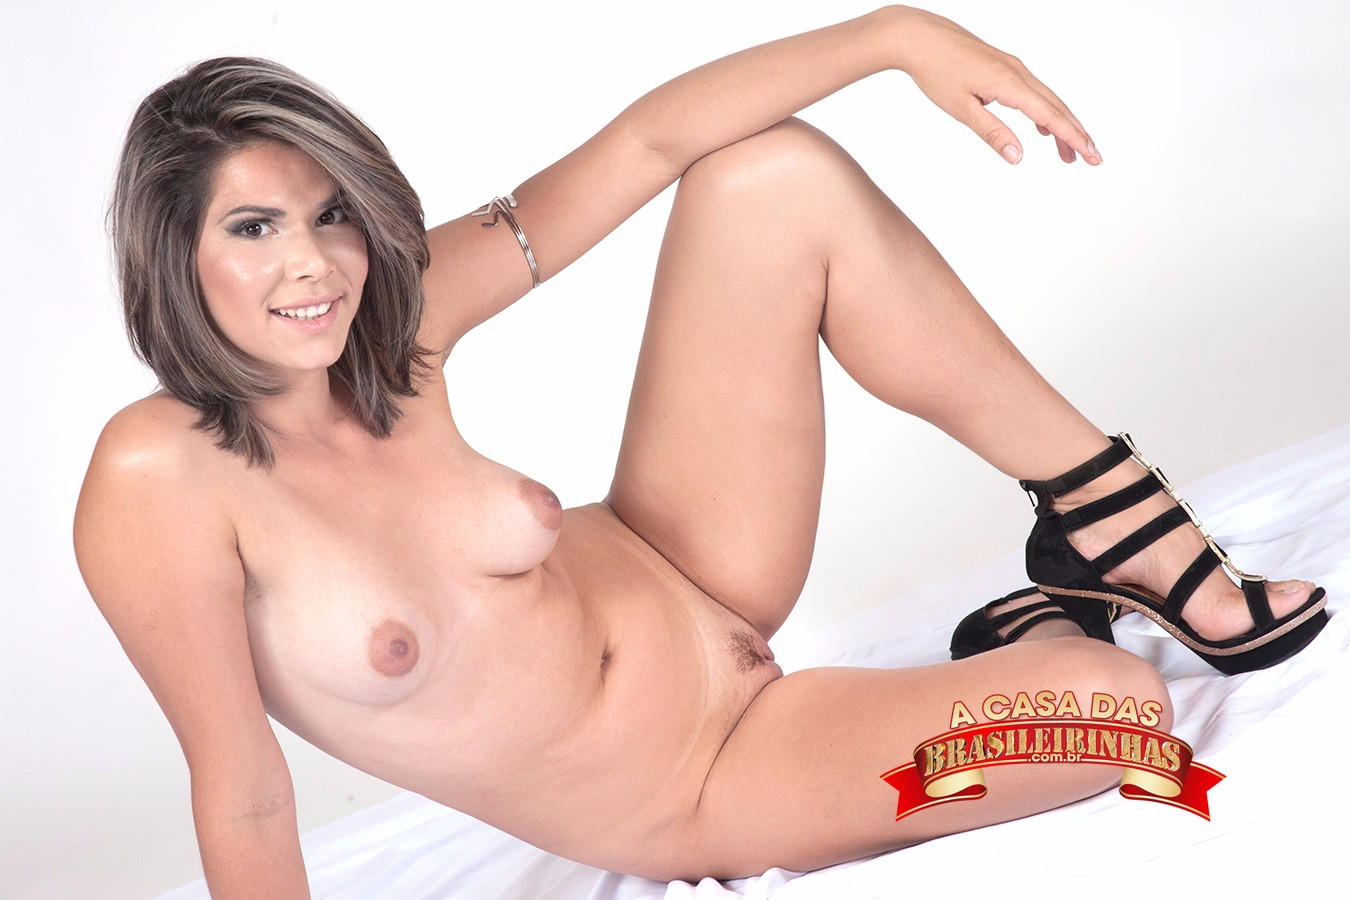 Emanuella-Martins-safada.jpg